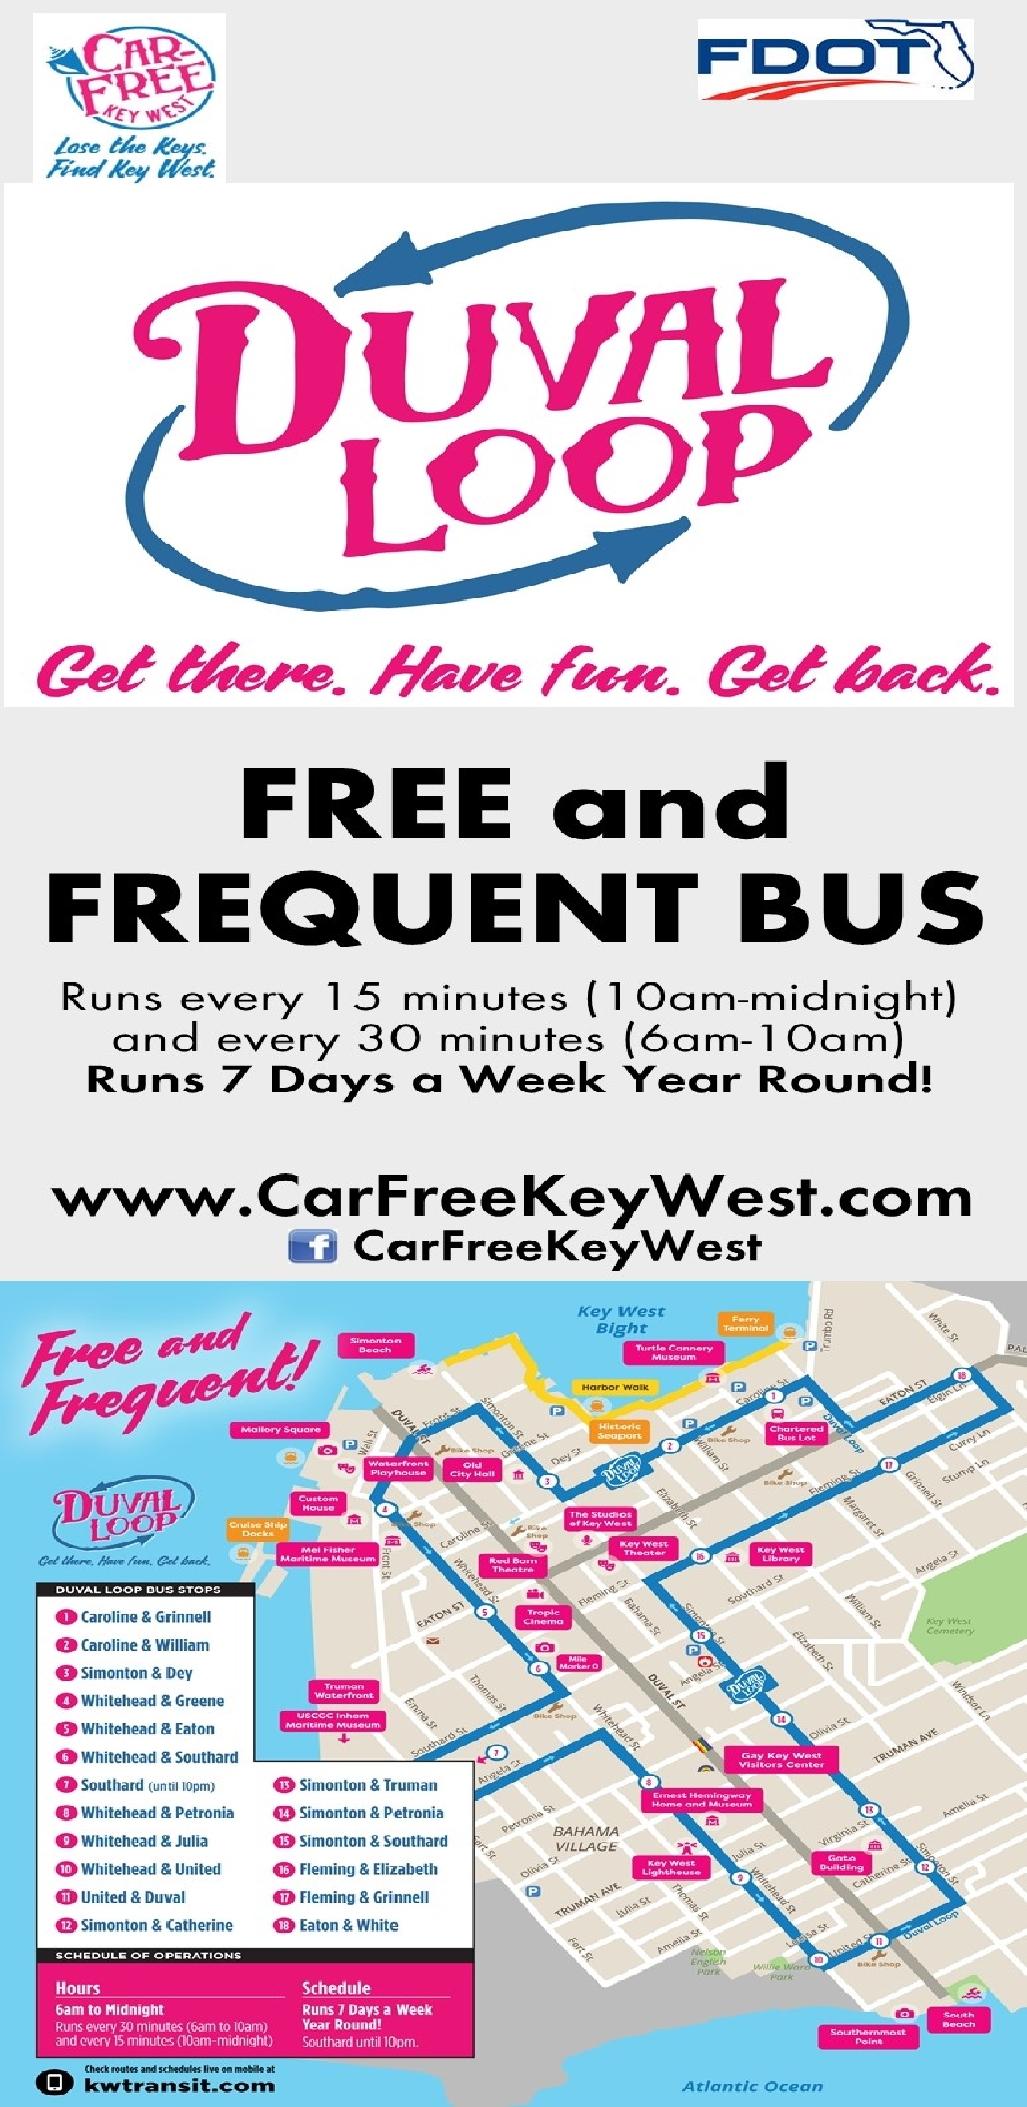 Duval Loop Free & Frequent Bus, Key West | Key West / Florida Keys on nashville bus map, portland bus map, mobile bus map, key west trolley schedule, key west maps to print, key west points of interest, dayton bus map, baltimore bus map, philadelphia bus route map, key west transit, santa ana bus map, houston bus map, gainesville bus map, sitka bus map, st. louis bus map, key west trolley route, san francisco bus map, key west villas disney world, golden gate bus map,